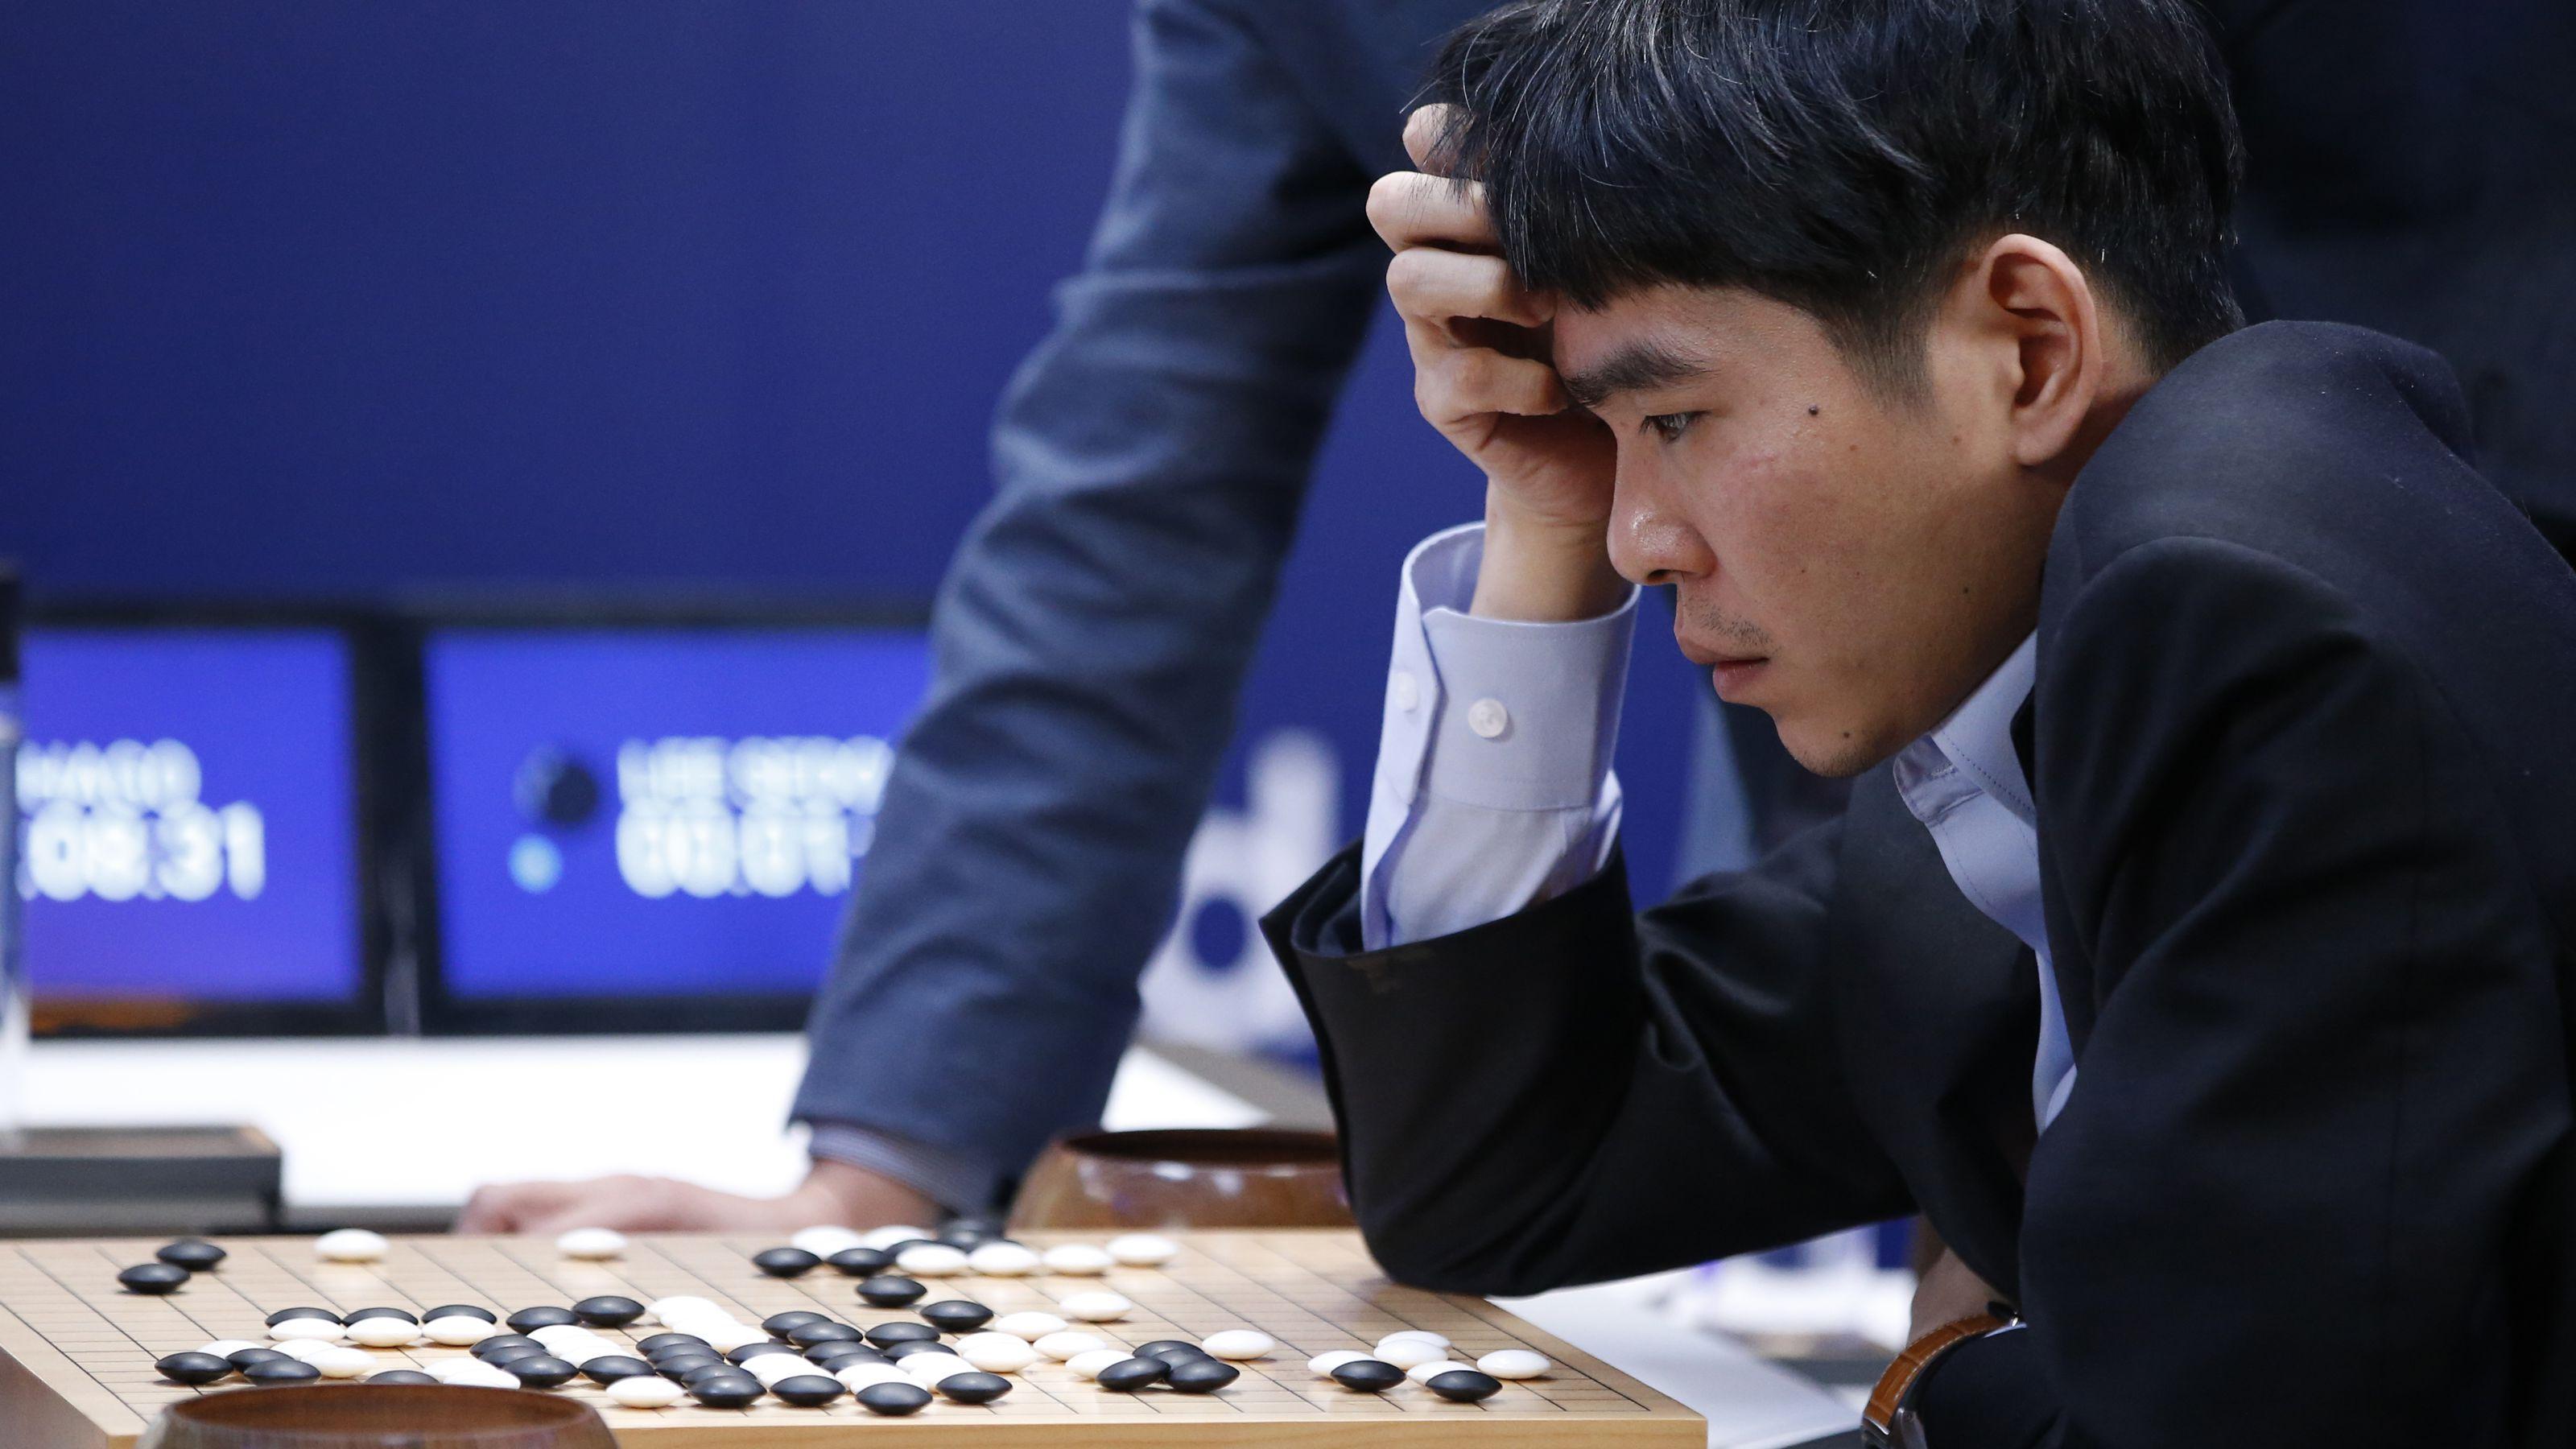 Intelligenza artificiale - AlphaGo - Gioco - Ke Jie Dotmug